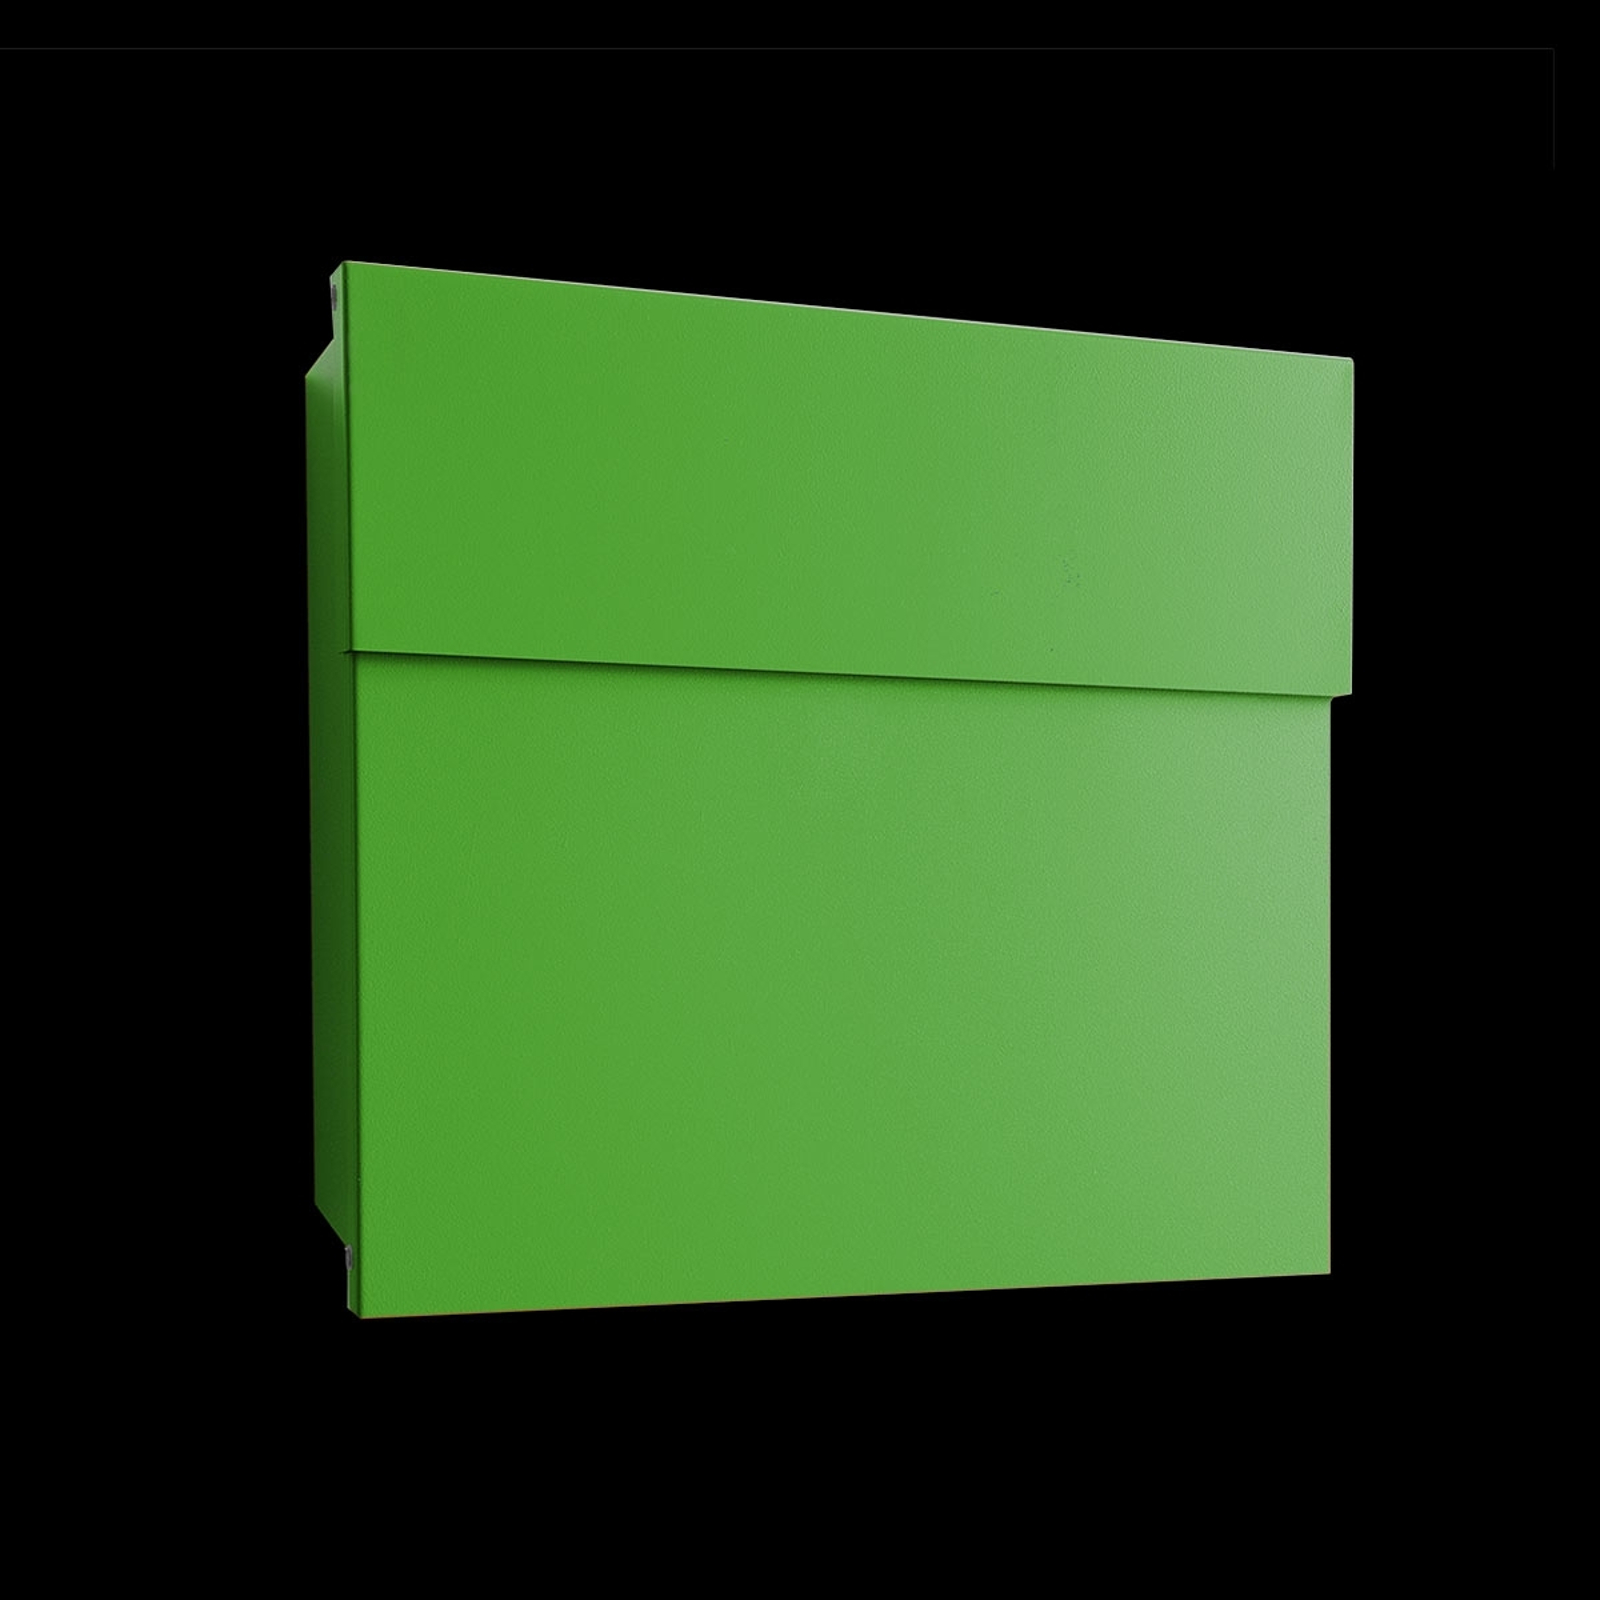 Design-brievenbus Letterman IV, groen